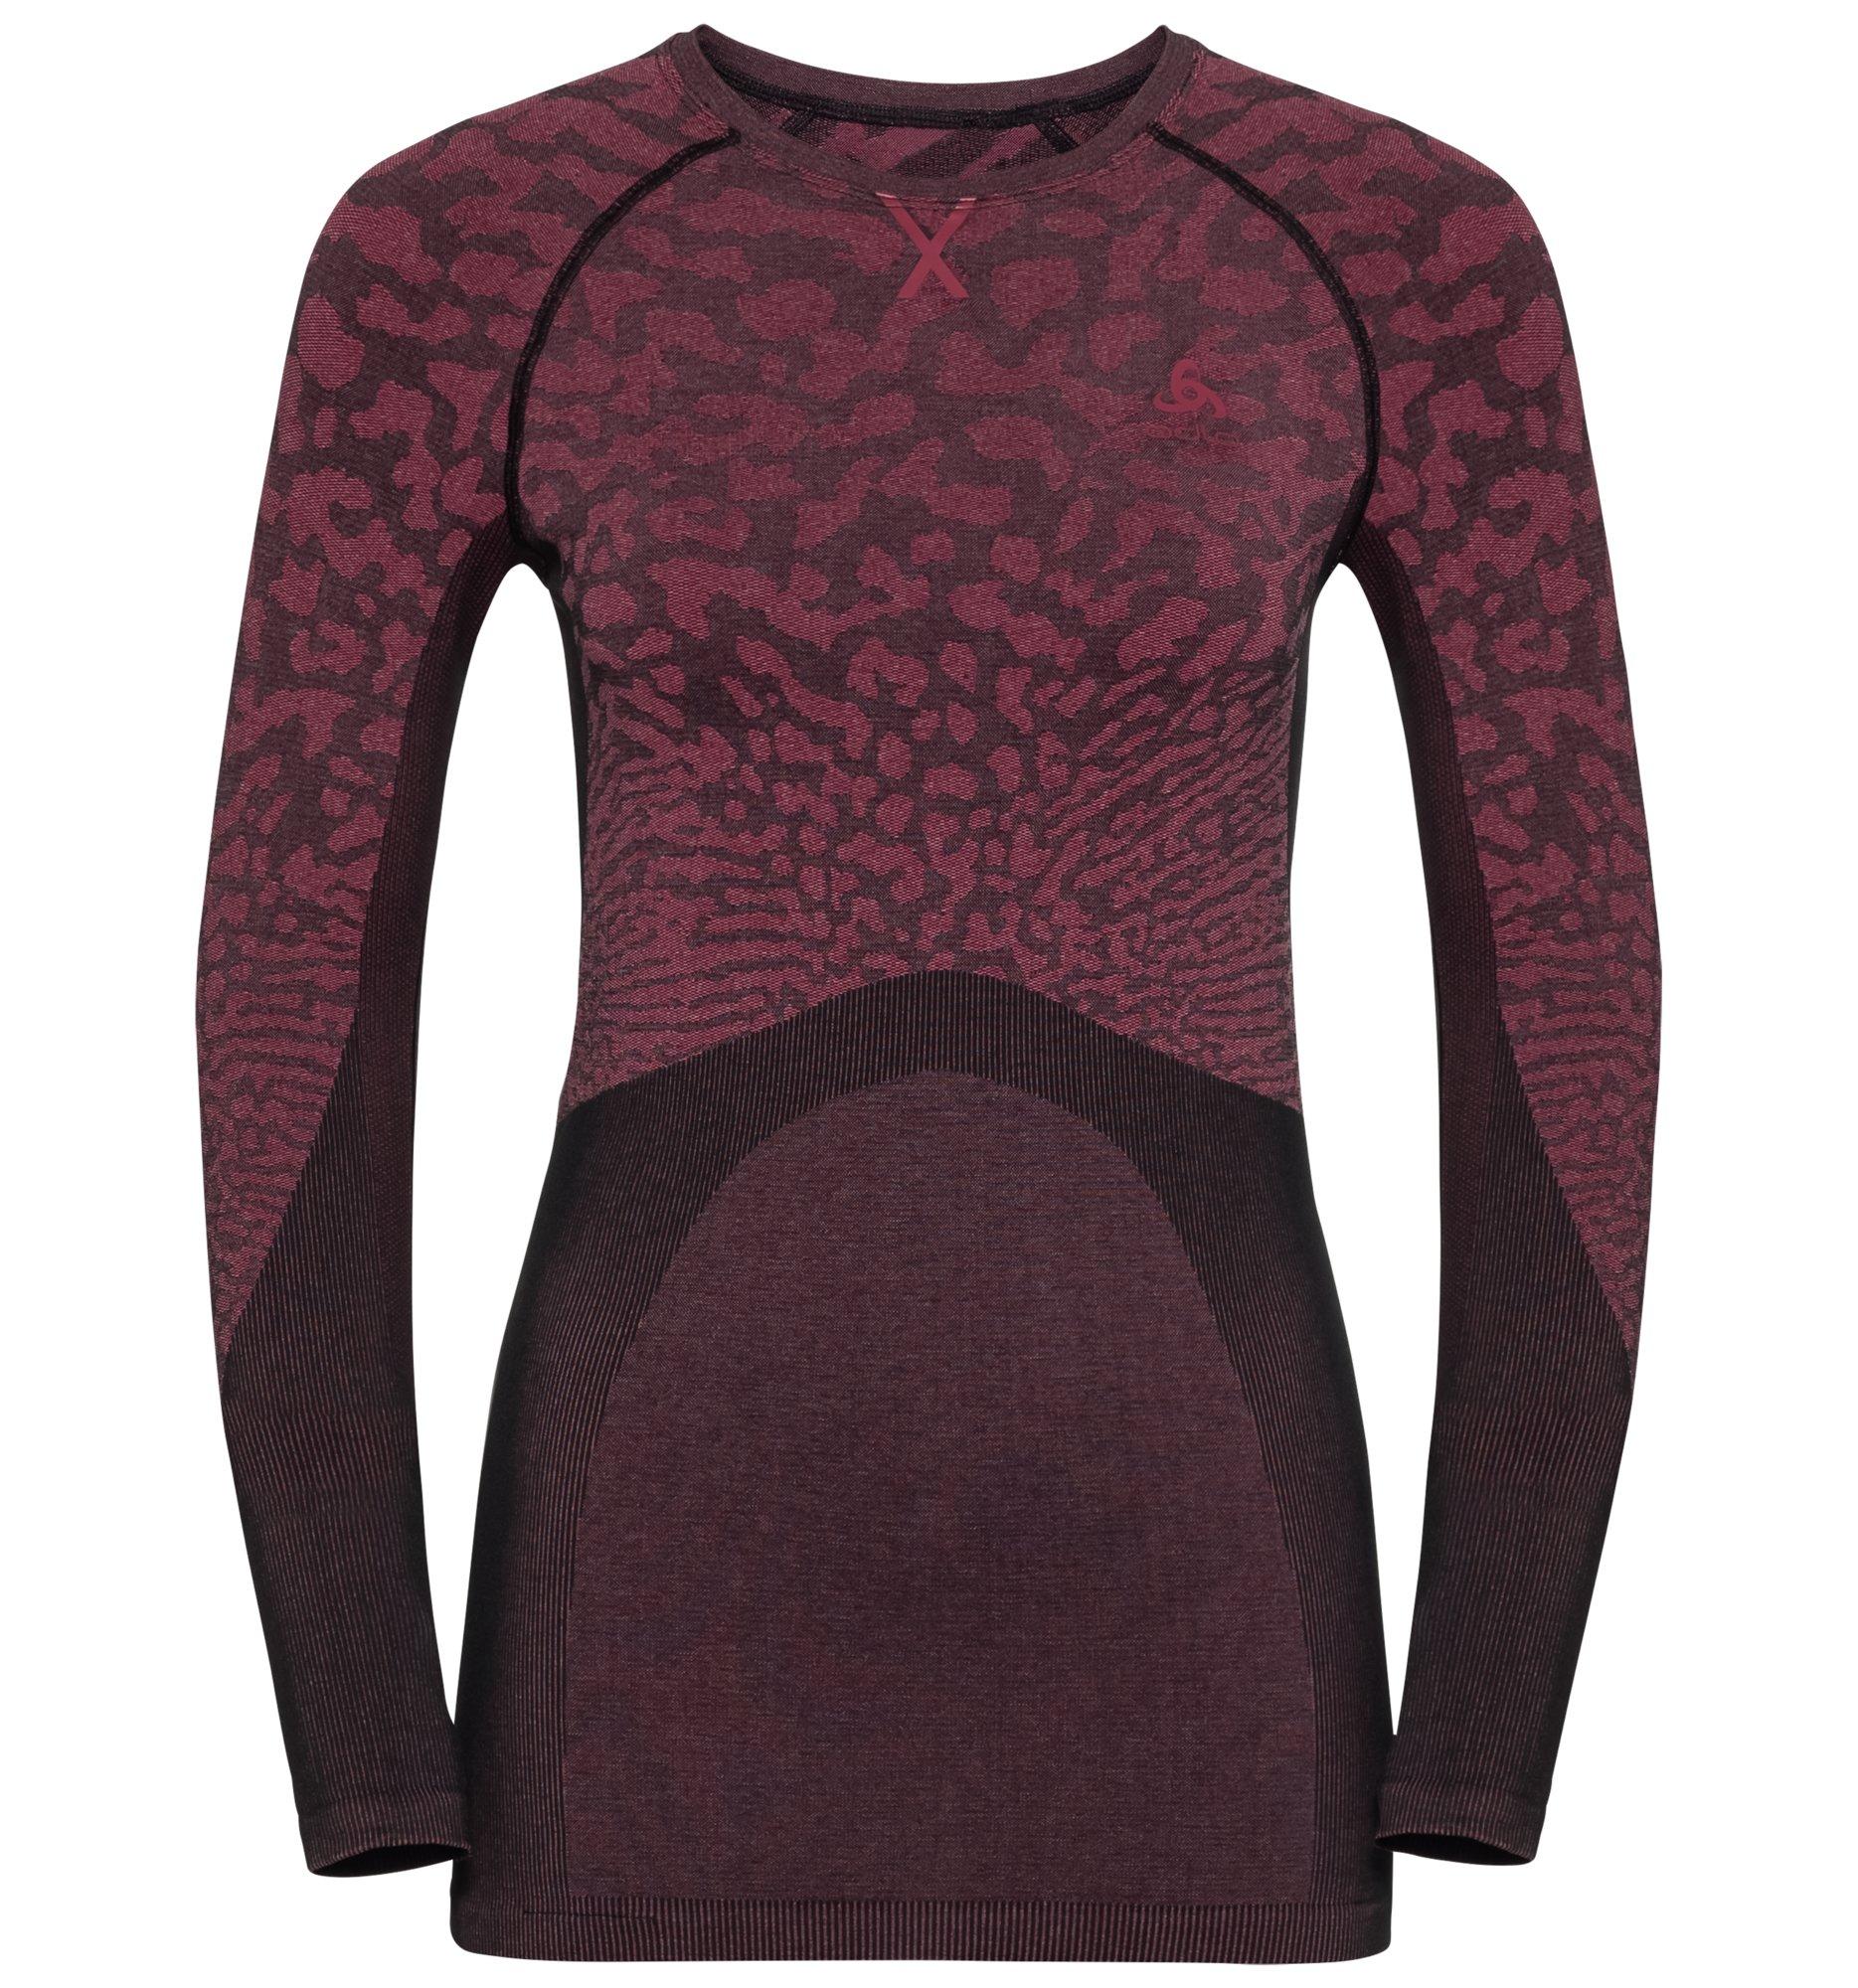 Odlo Damen BLACKCOMB Funktionsunterwäsche Langarm-Shirt - cerise